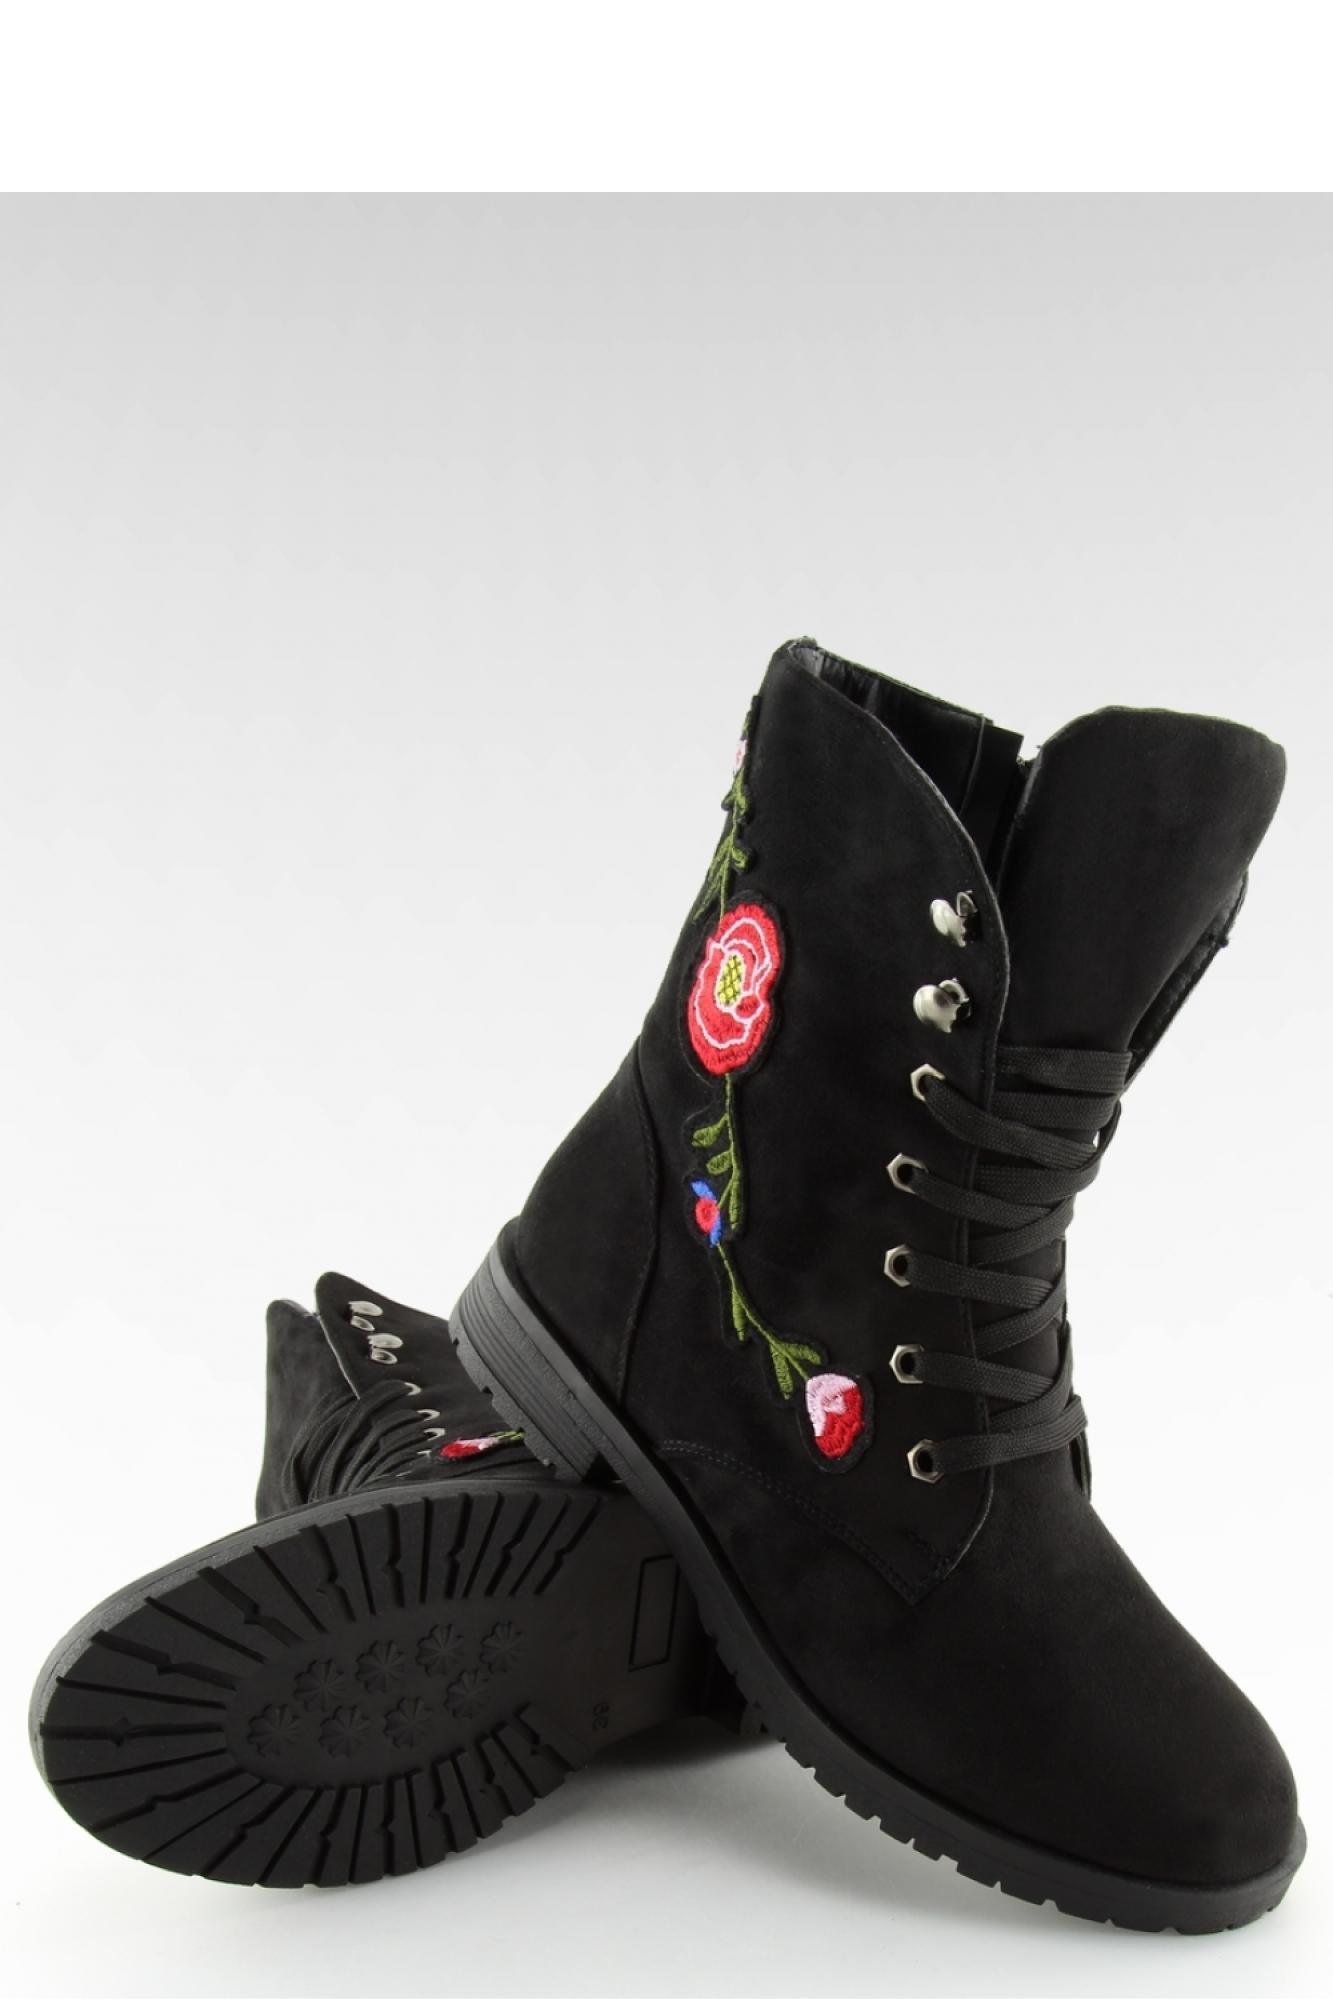 23f9f181f57e7 Inello - Женская обувь WORKERY Z HAFTEM CZARNE AB-9 BLACK - Inello ~Workery